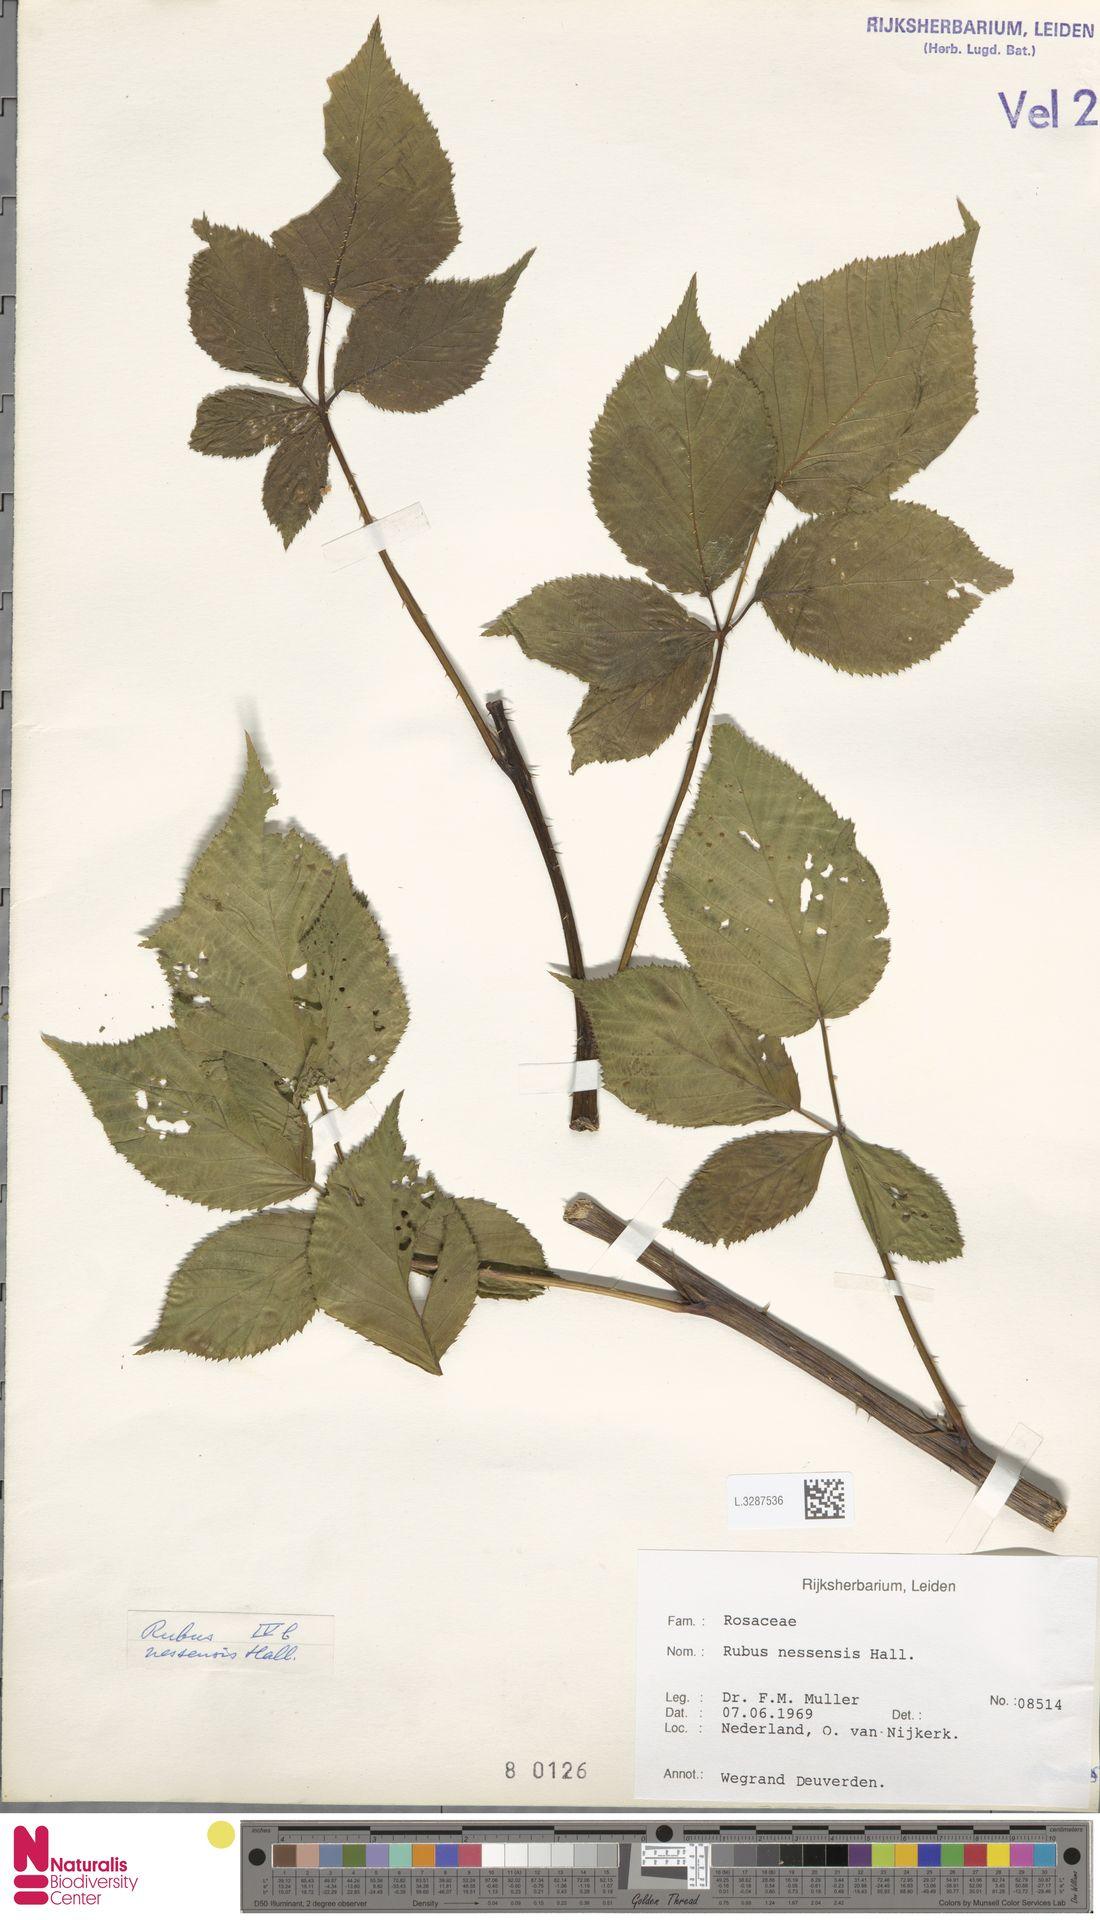 L.3287536 | Rubus nessensis Hall